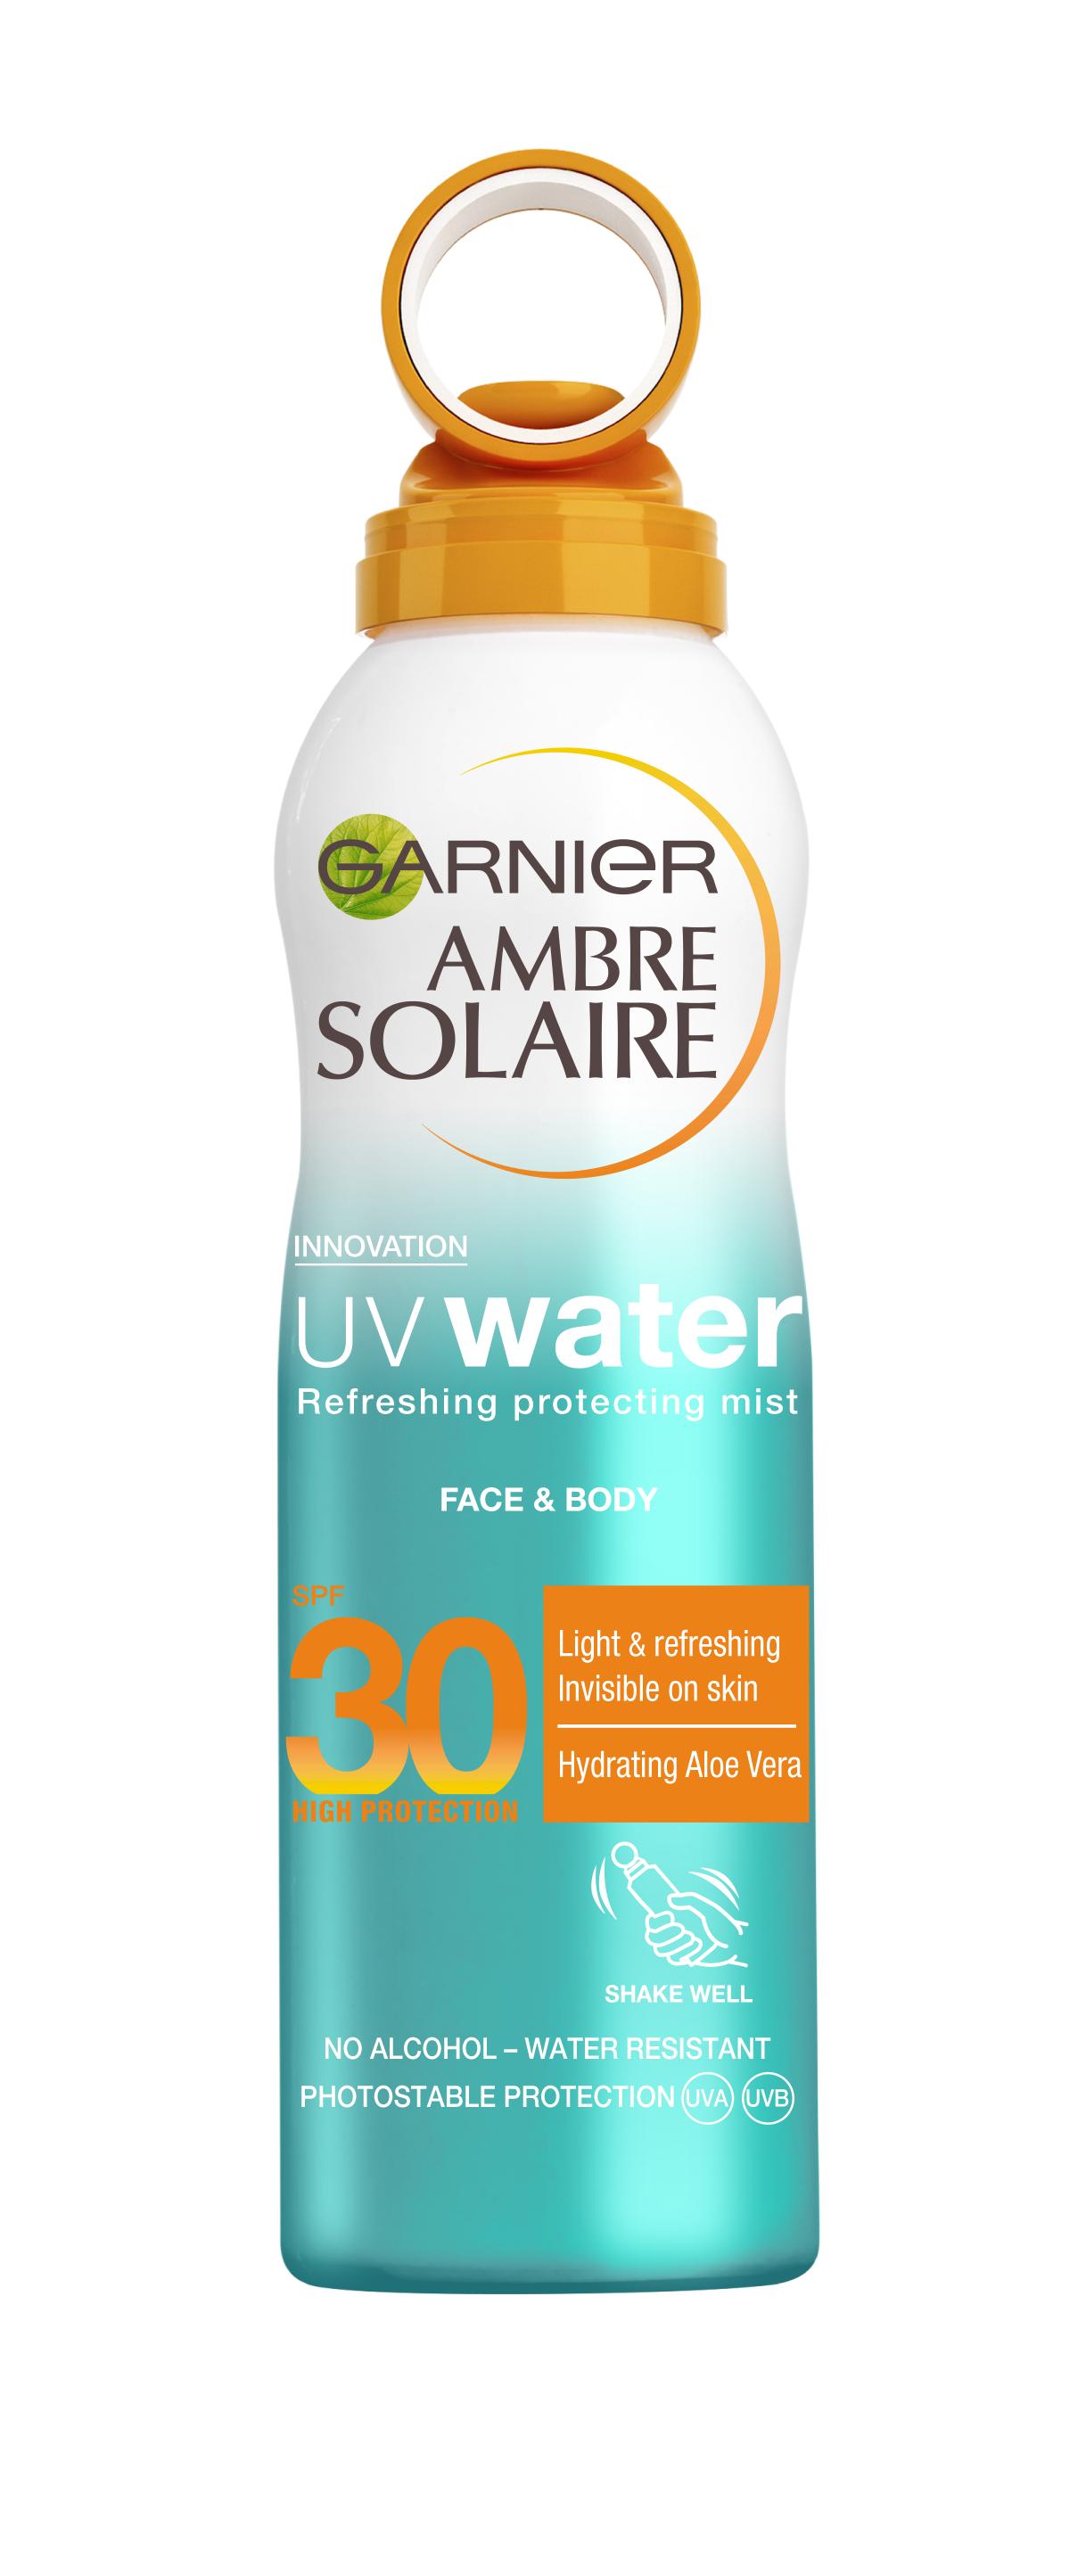 GARNIER AMBRE SOLAIRE - UV WATER MIST SPF30